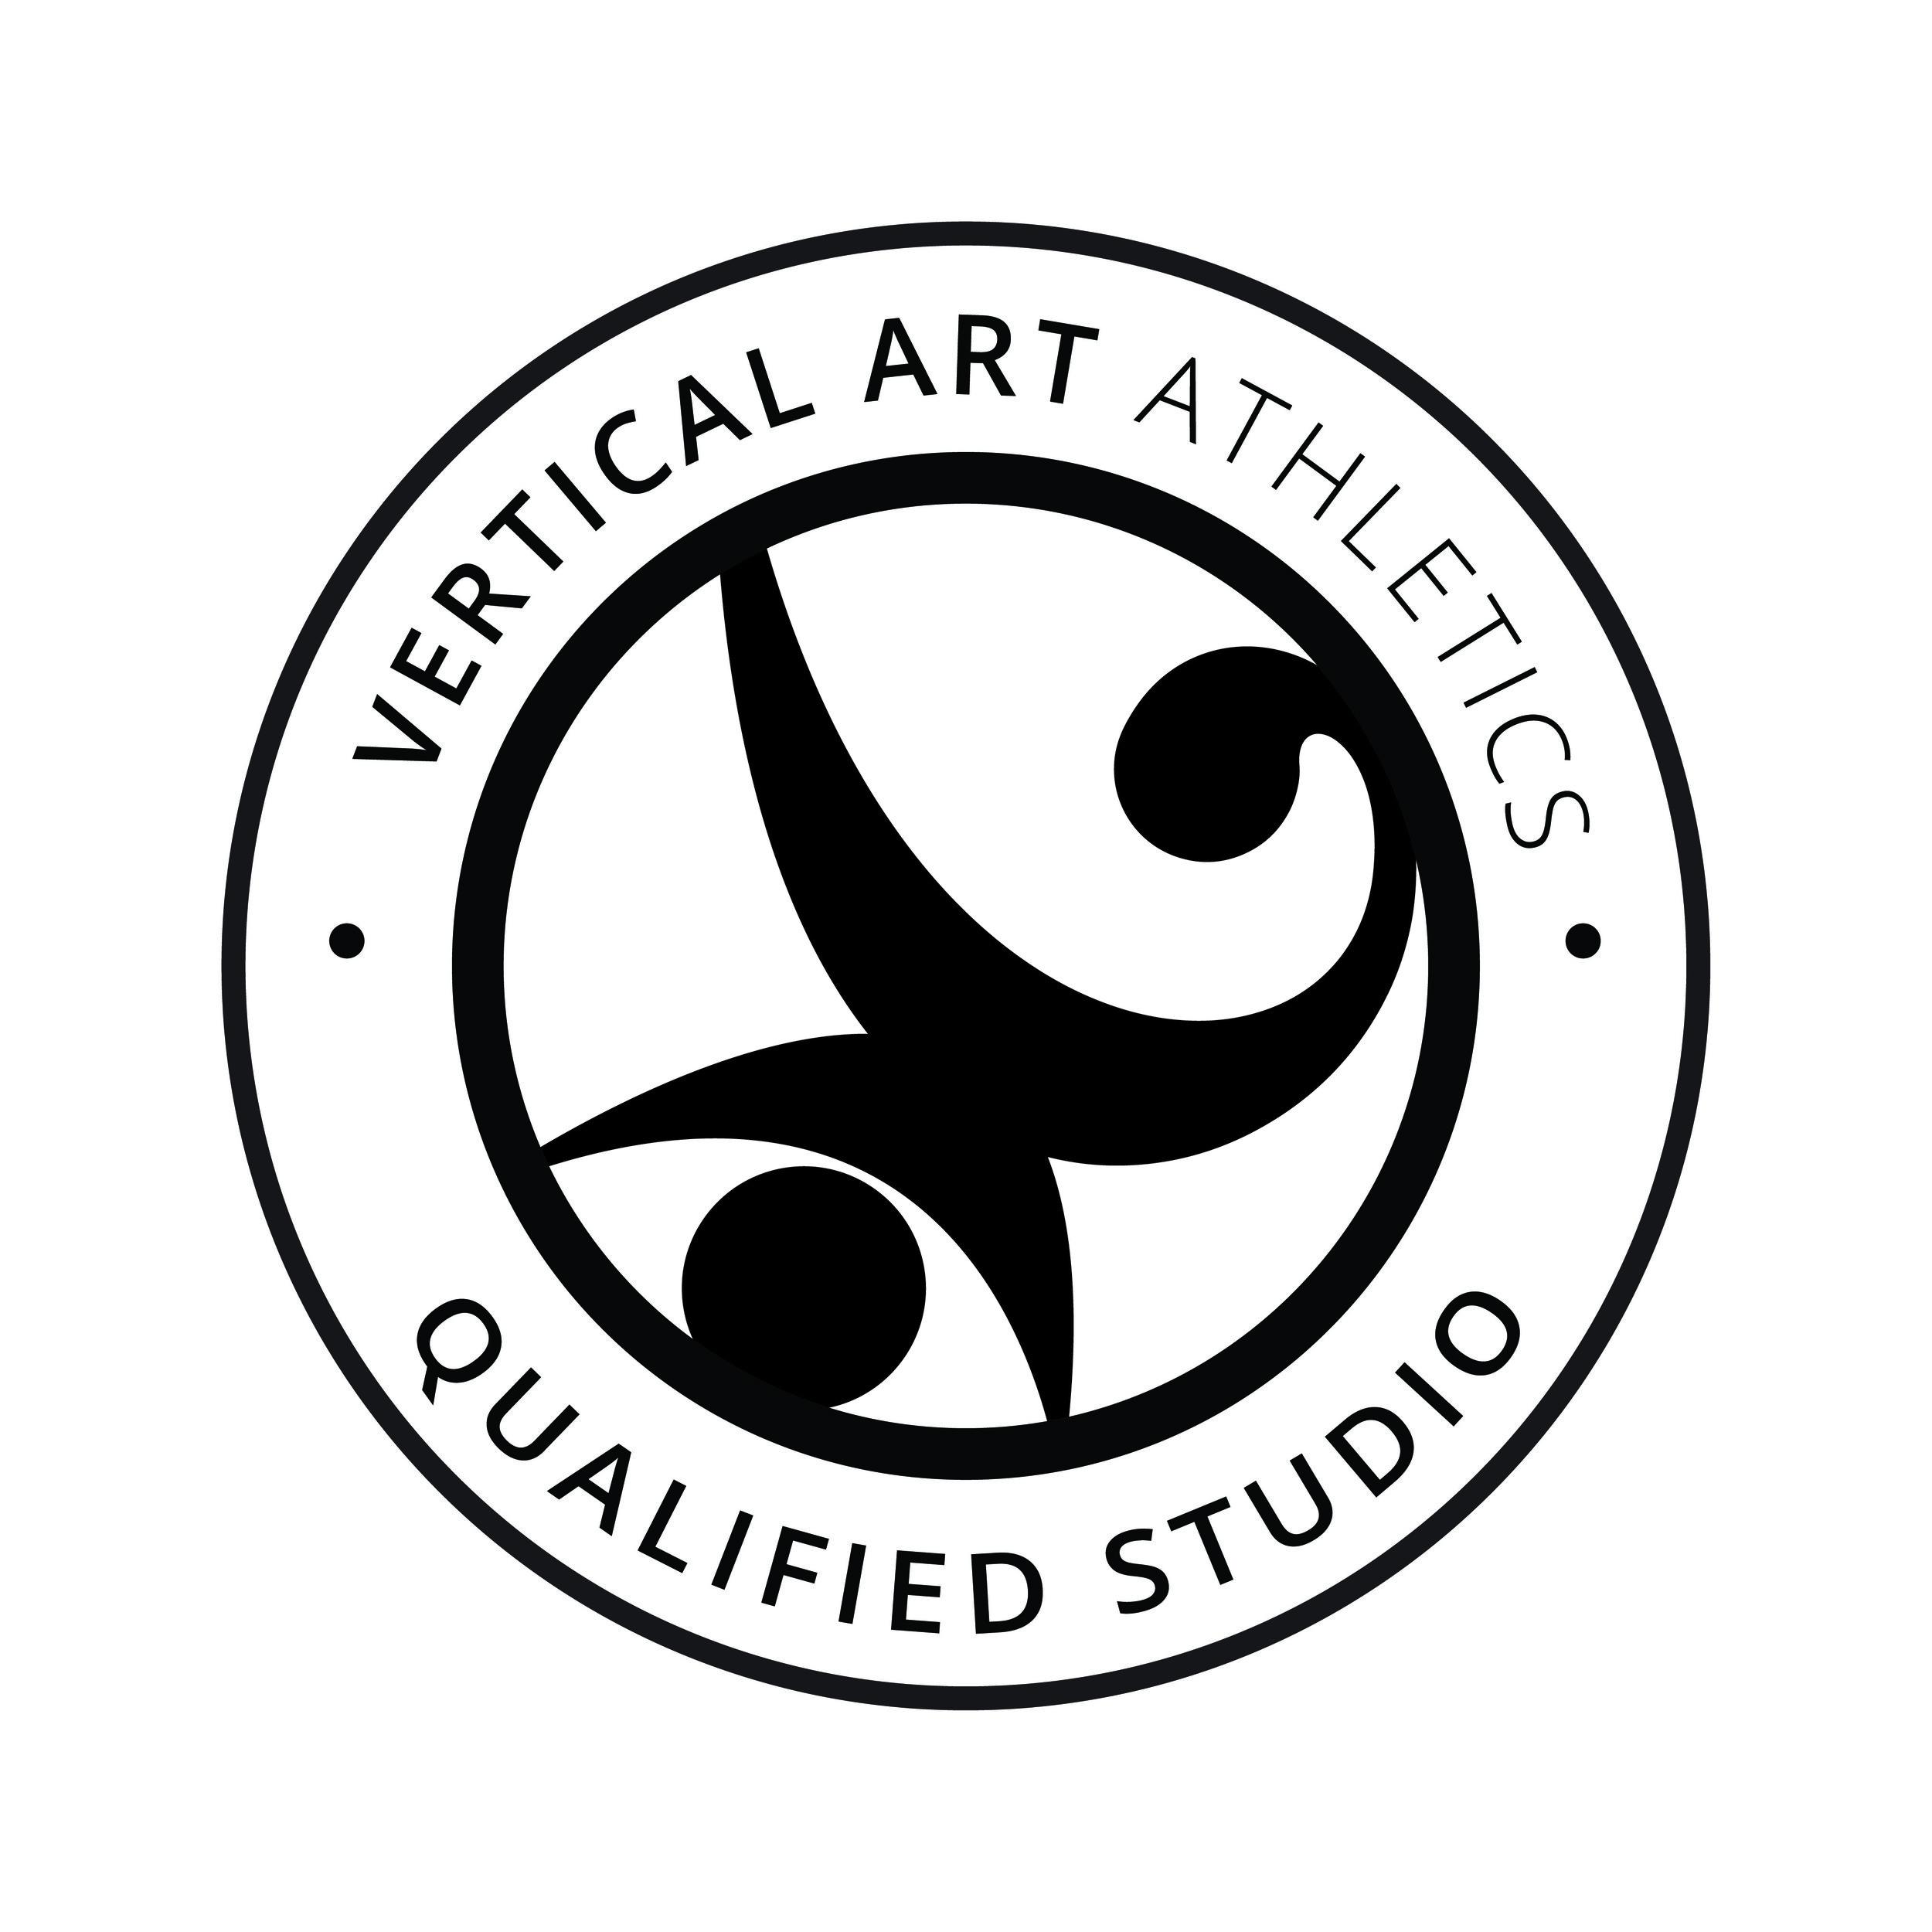 vertical-art-athletics-qualified-studio-hr.jpg